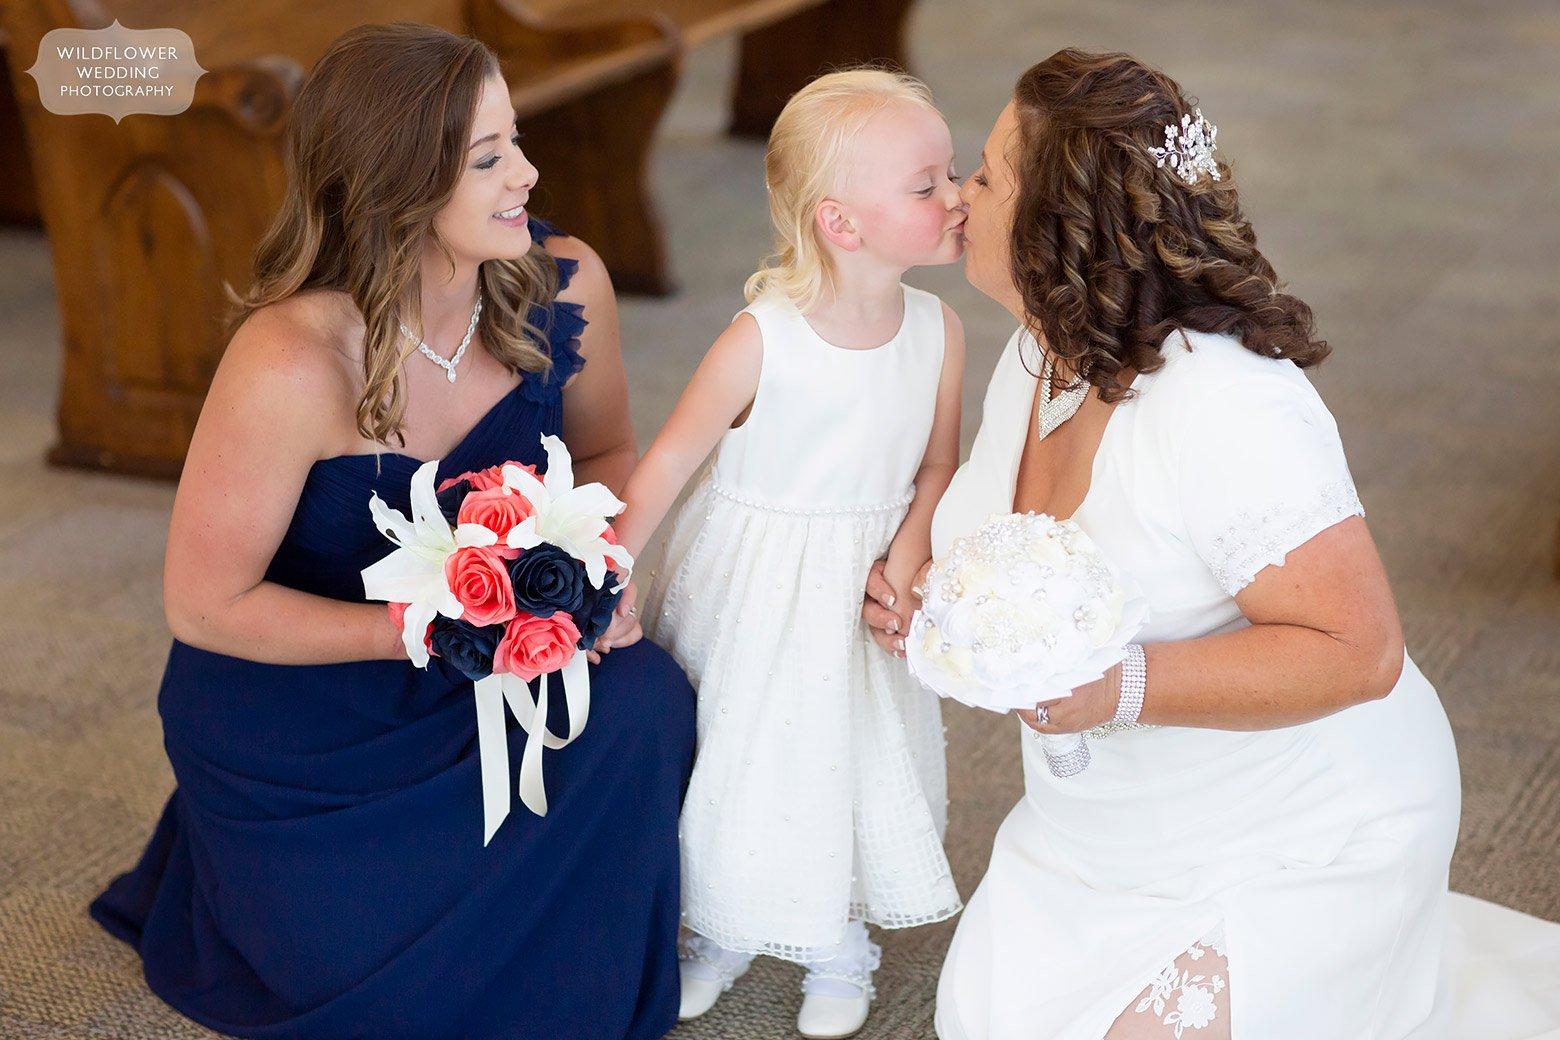 Candid wedding photographer captures Hermann Hill Weddings flower girl.